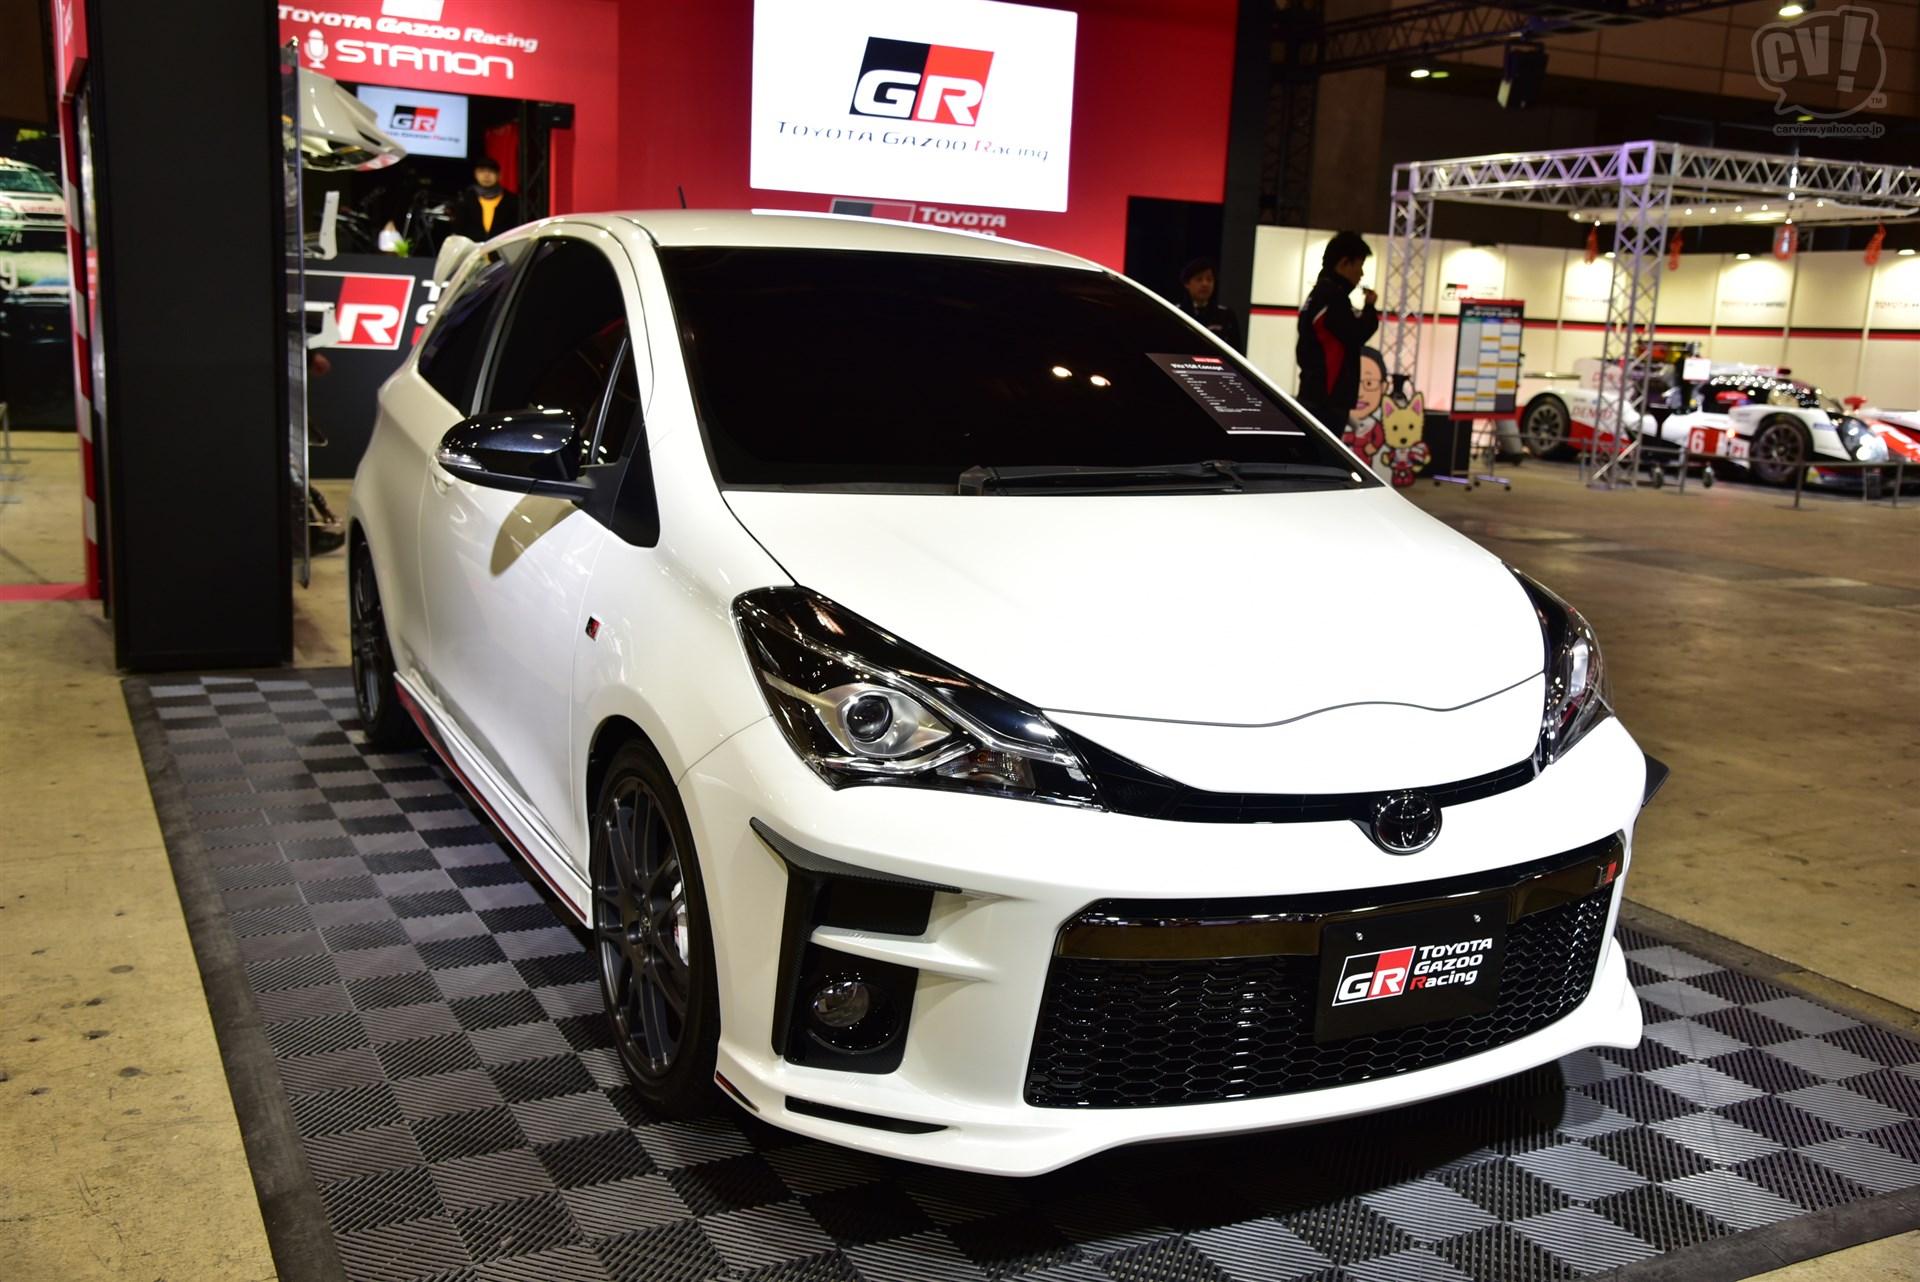 Toyota Vitz TGR Concept